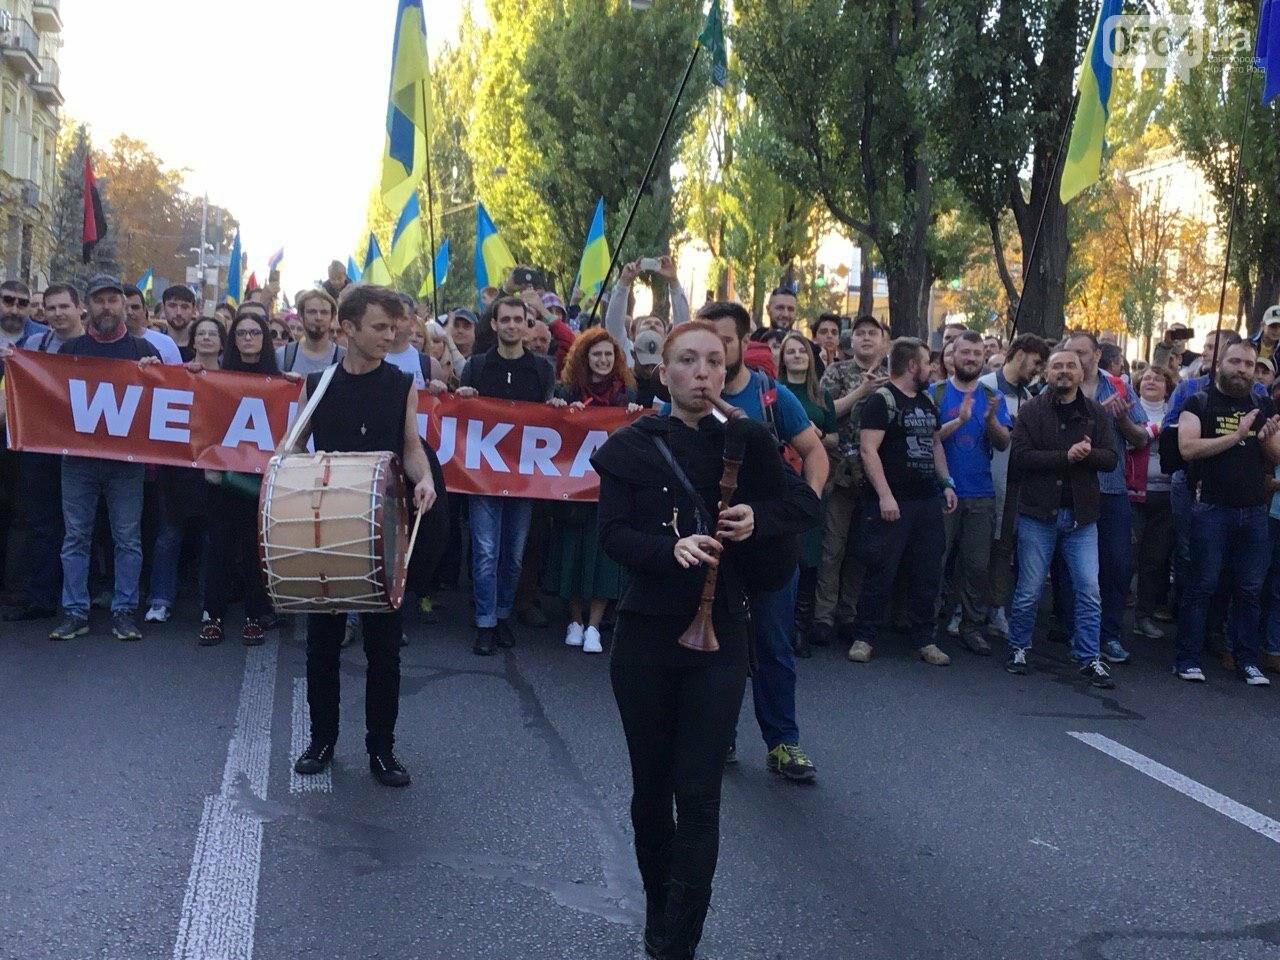 Криворожане поддержали Марш сопротивления капитуляции в Киеве, - ФОТО, ВИДЕО, ОБНОВЛЕНО, фото-13